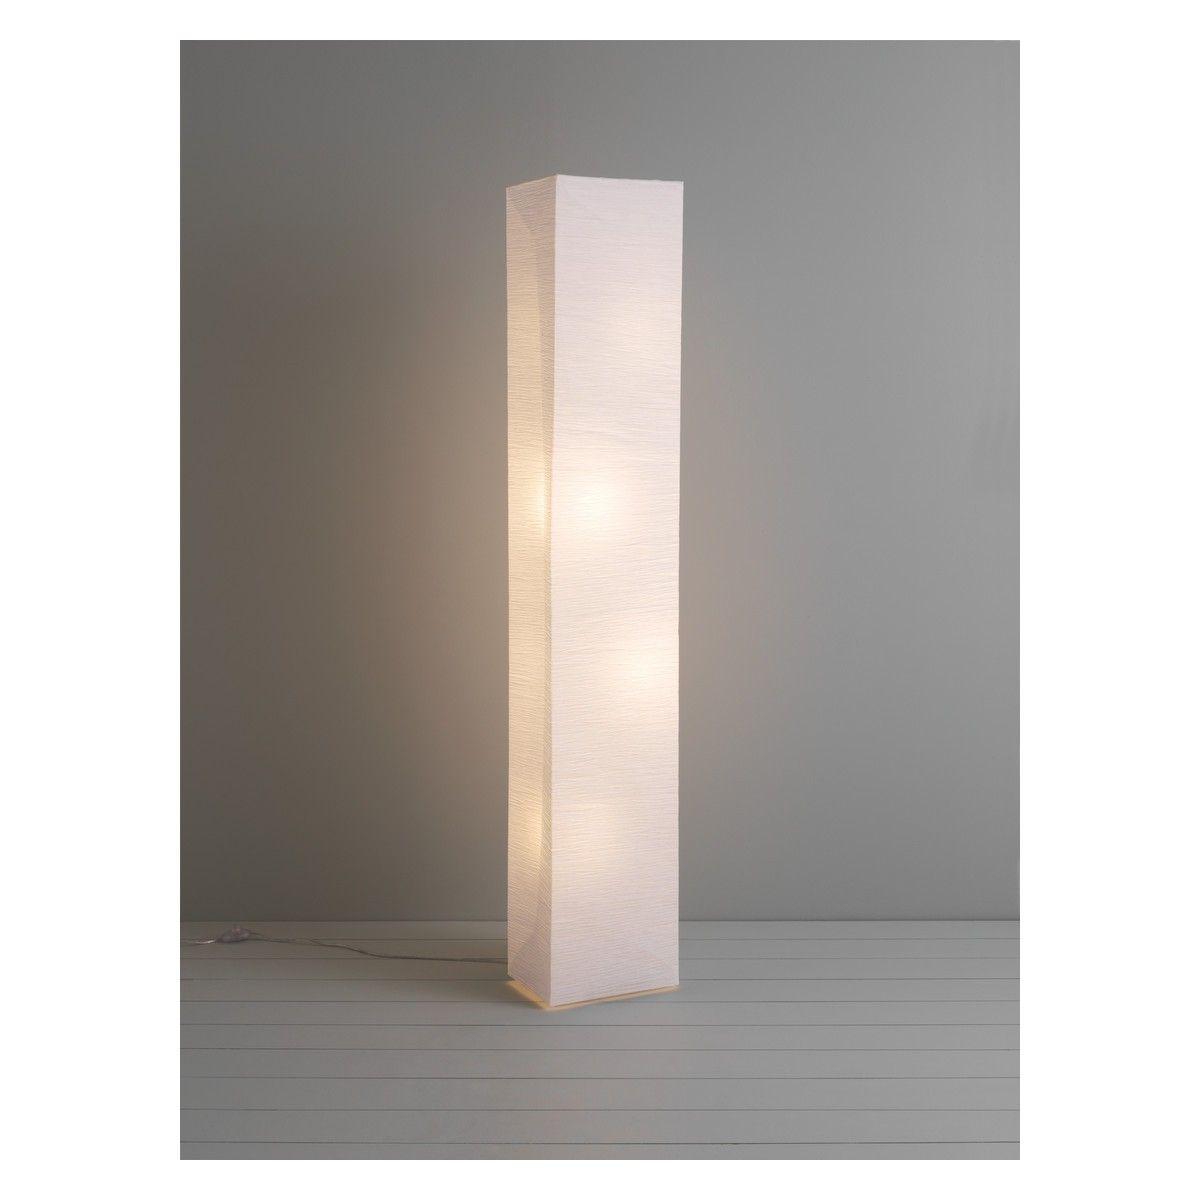 Unique white floor lamps - Square Paper White Crinkled Paper Floor Lamp